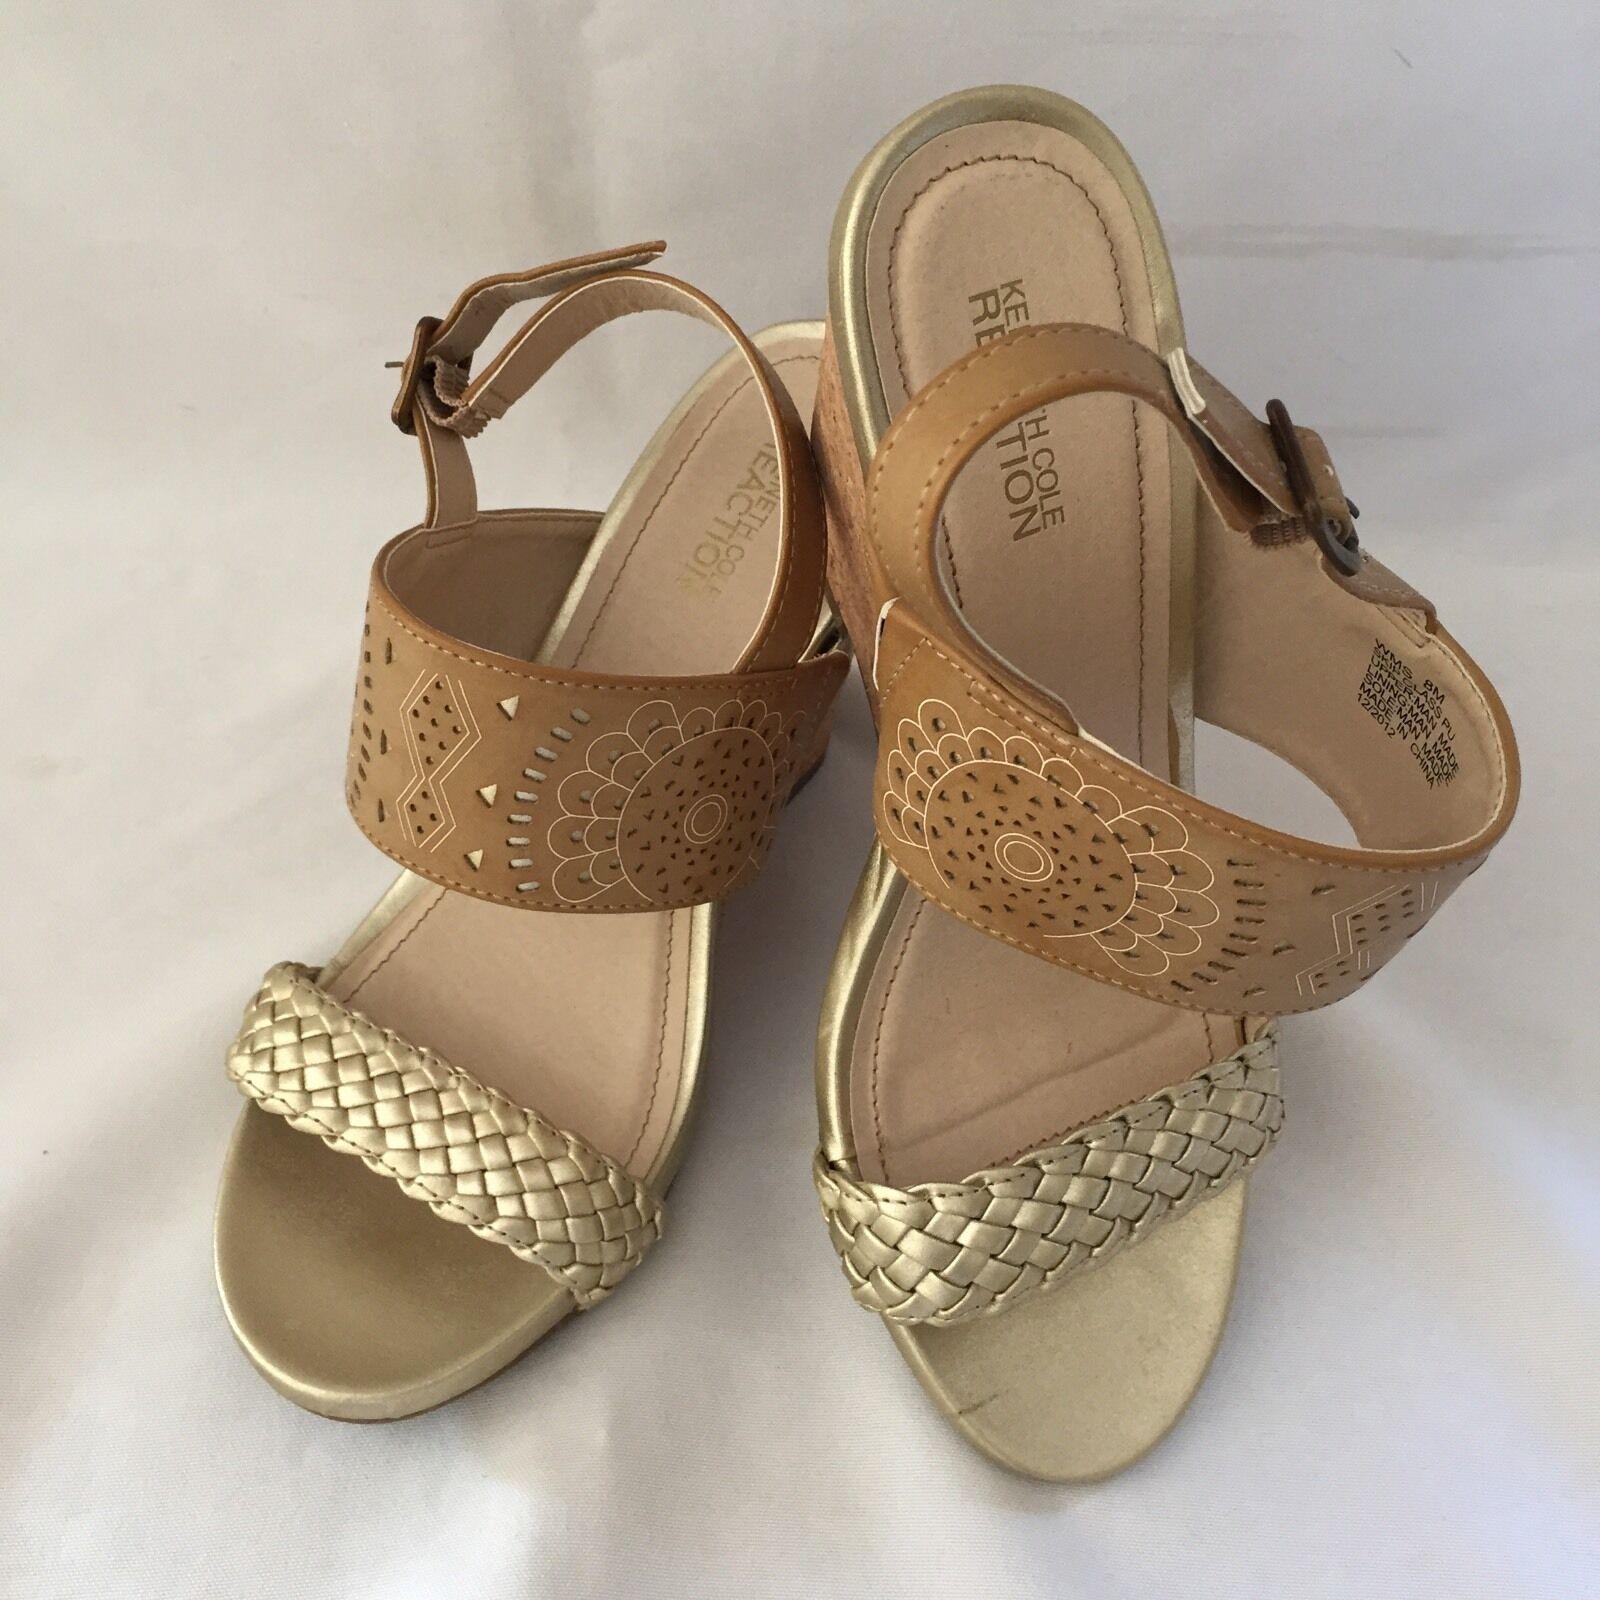 Kenneth Cole Reaction Size Woman's Wedge Sandals - Size Reaction 8M b6851d